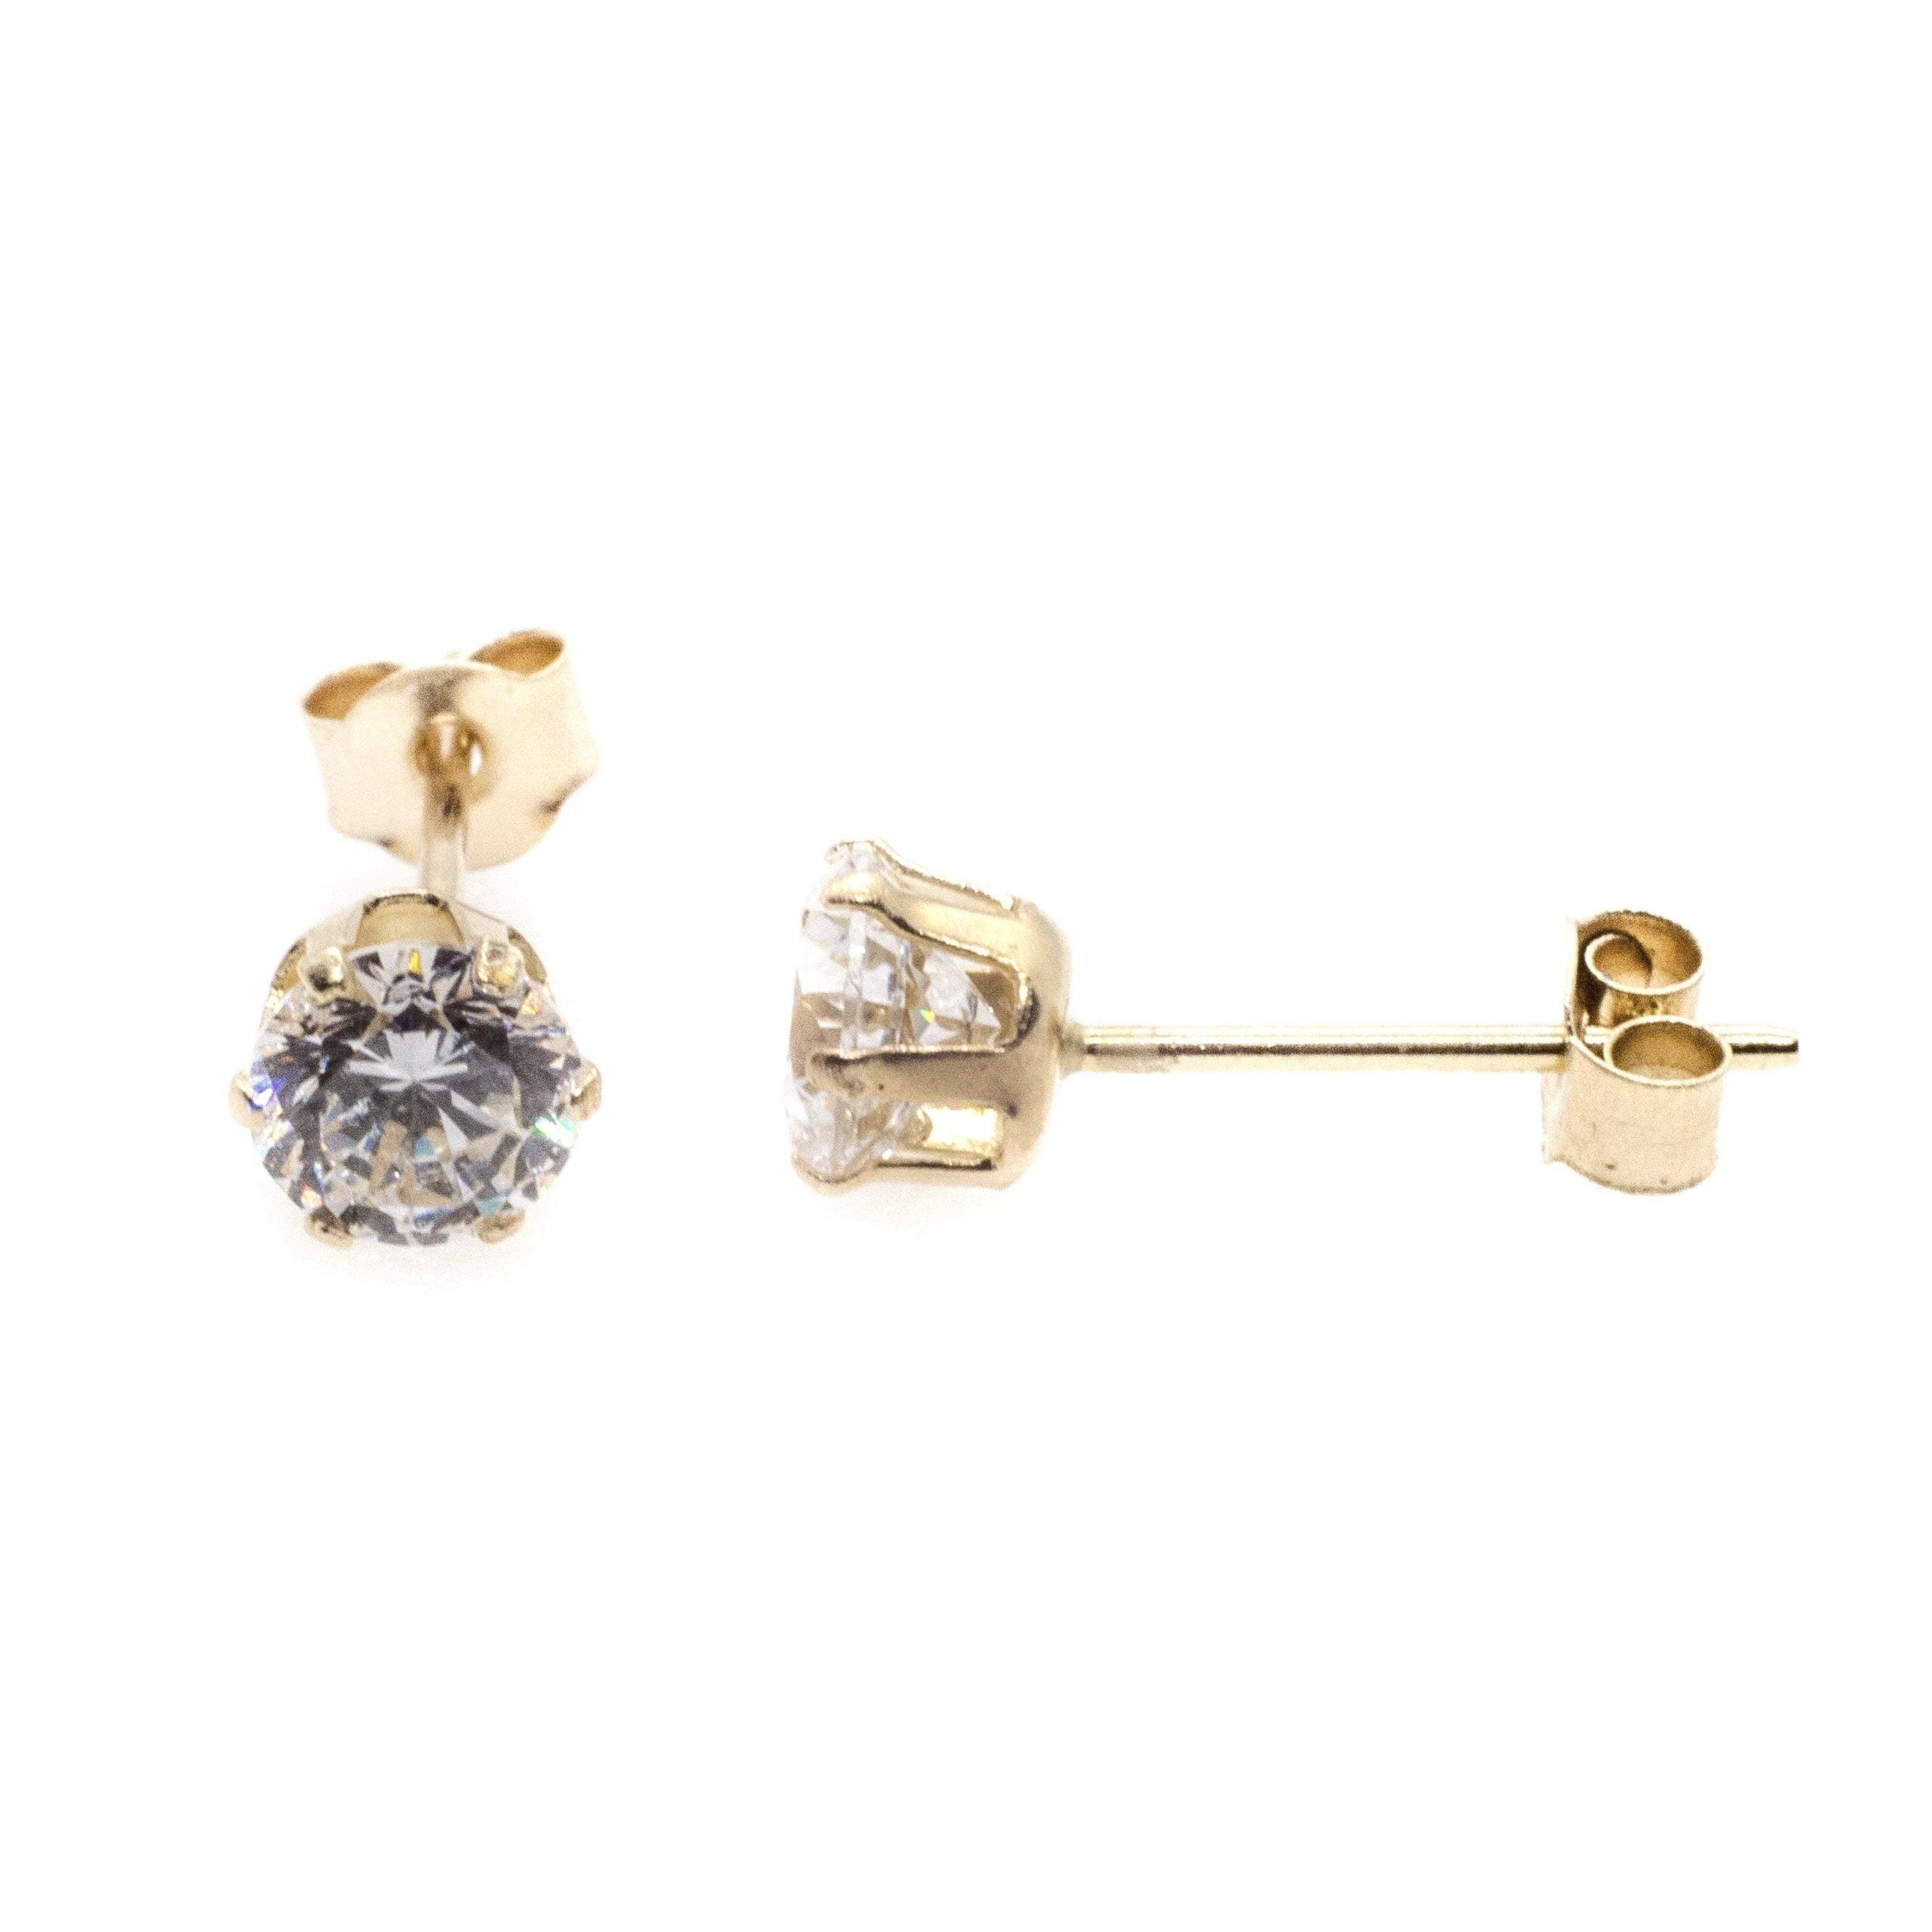 3mm CZ stud earrings 9ct yellow gold alt 2